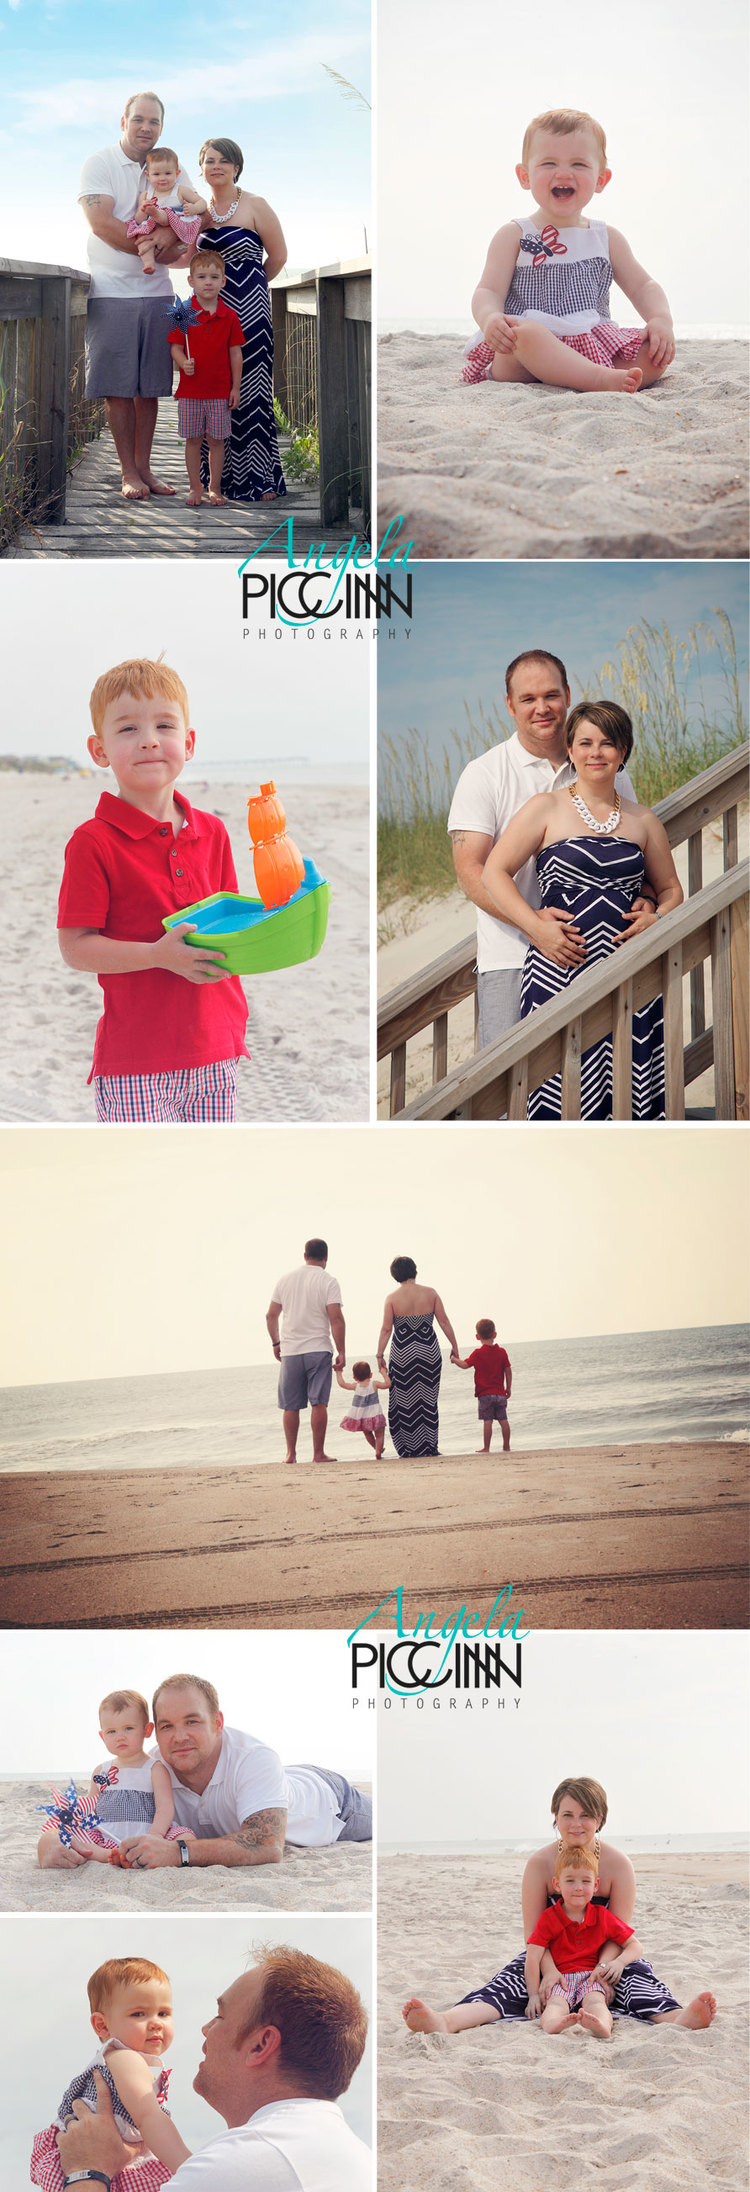 Carolina Beach Family Portraits by Angela Piccinin